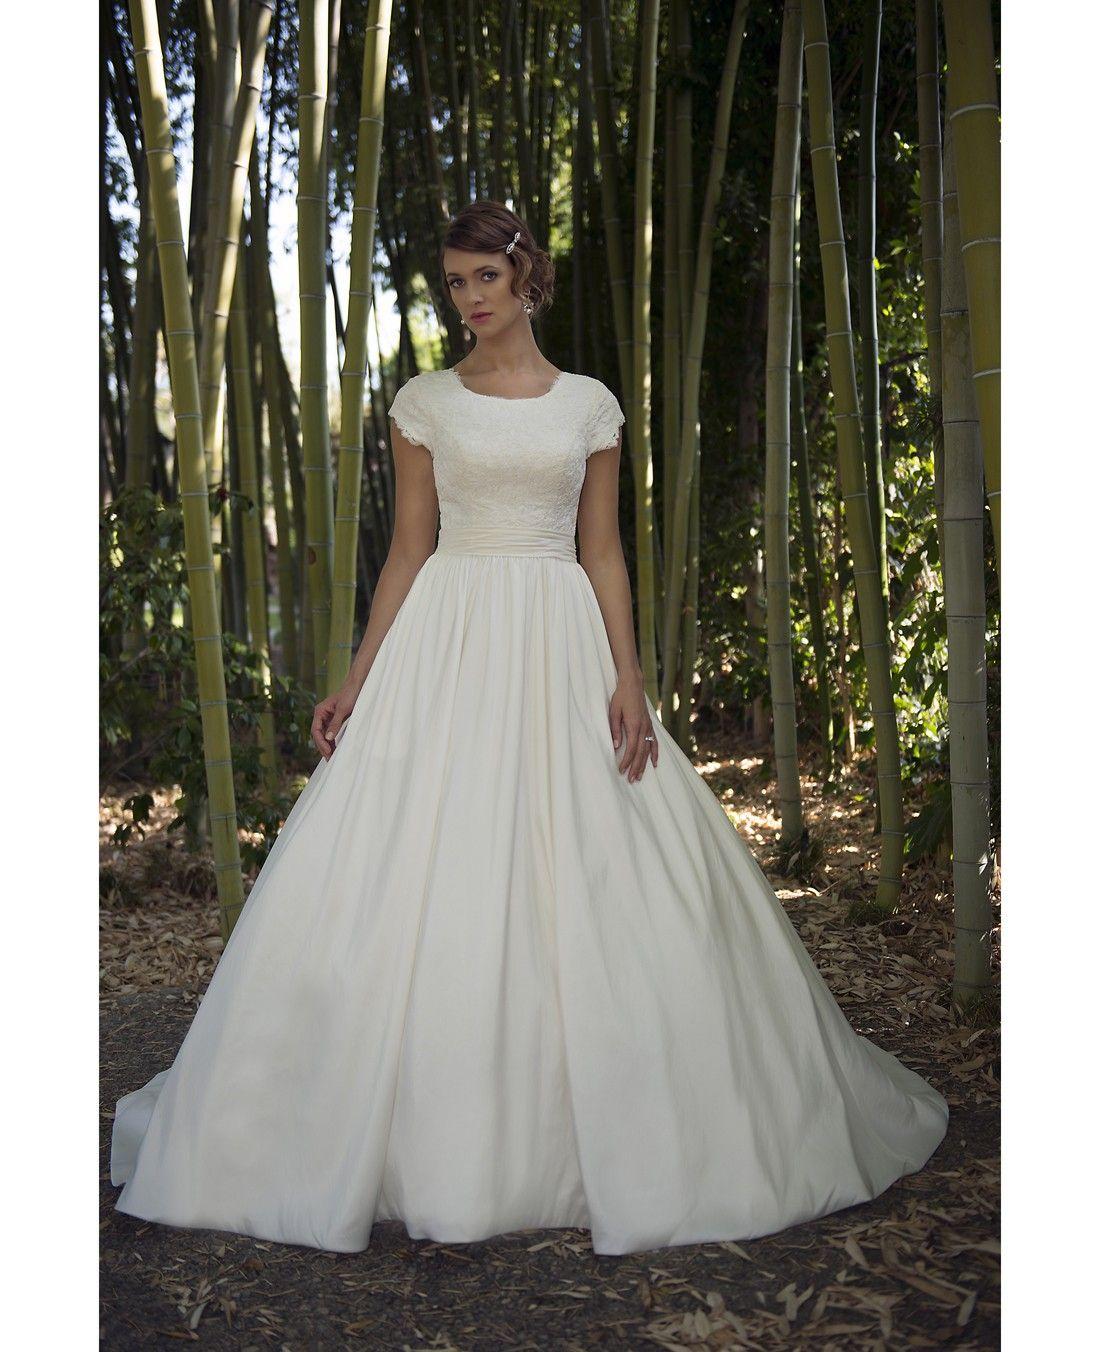 Tb7707 Modest wedding dresses, Wedding dresses, Modest